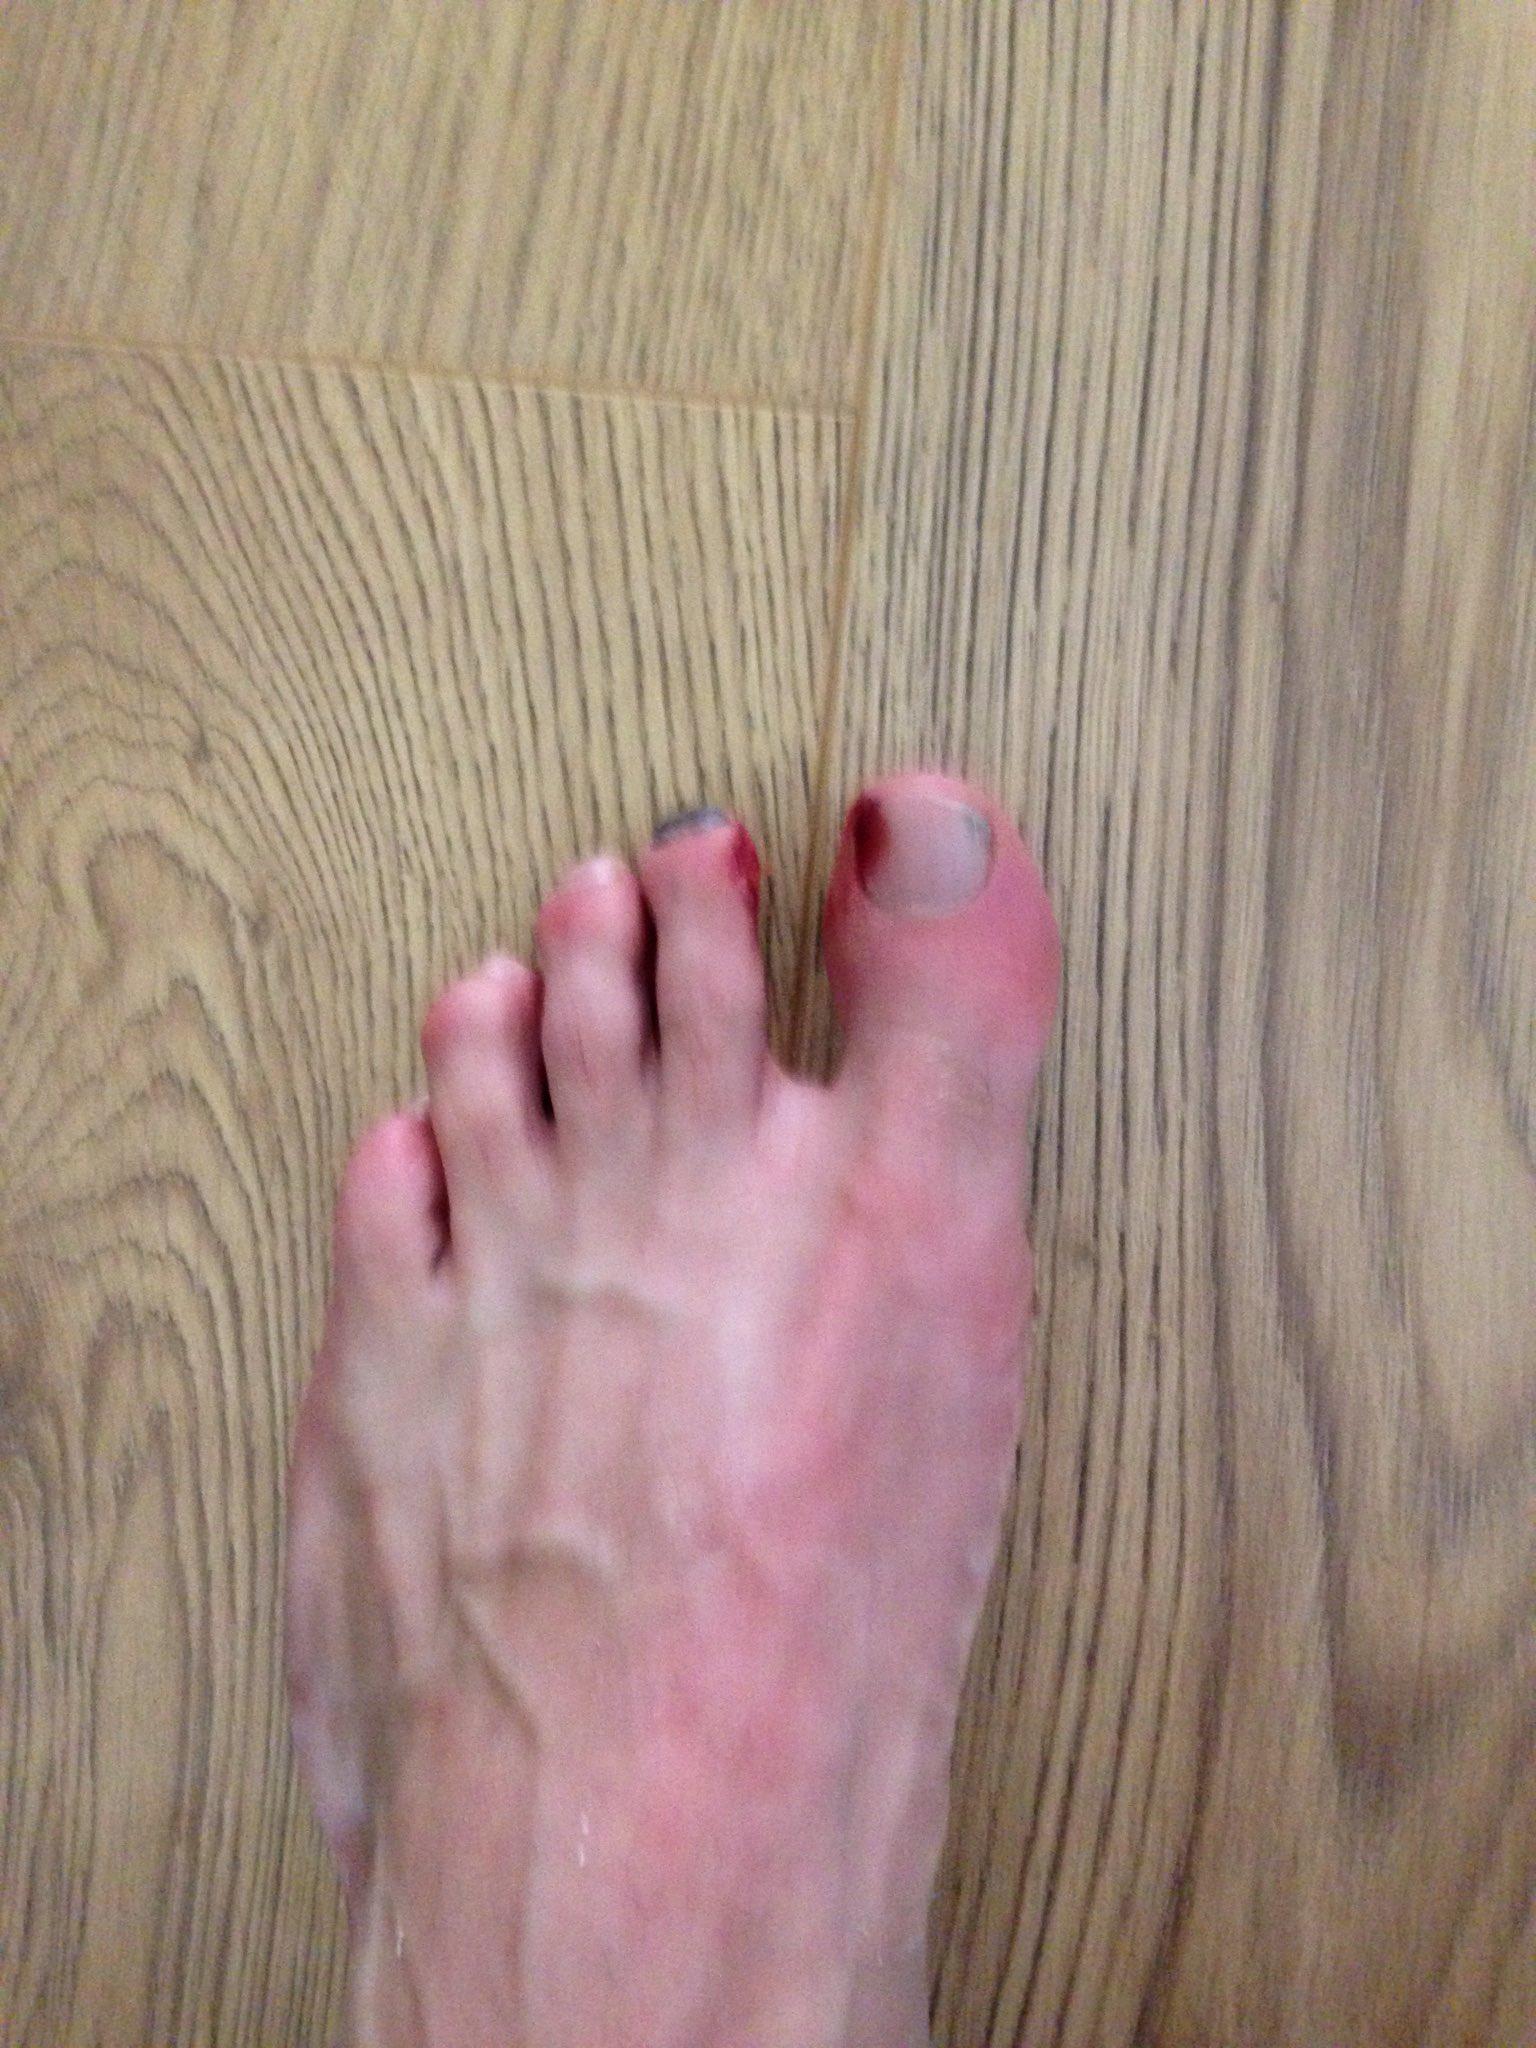 The bbw foot fetish pics quite good